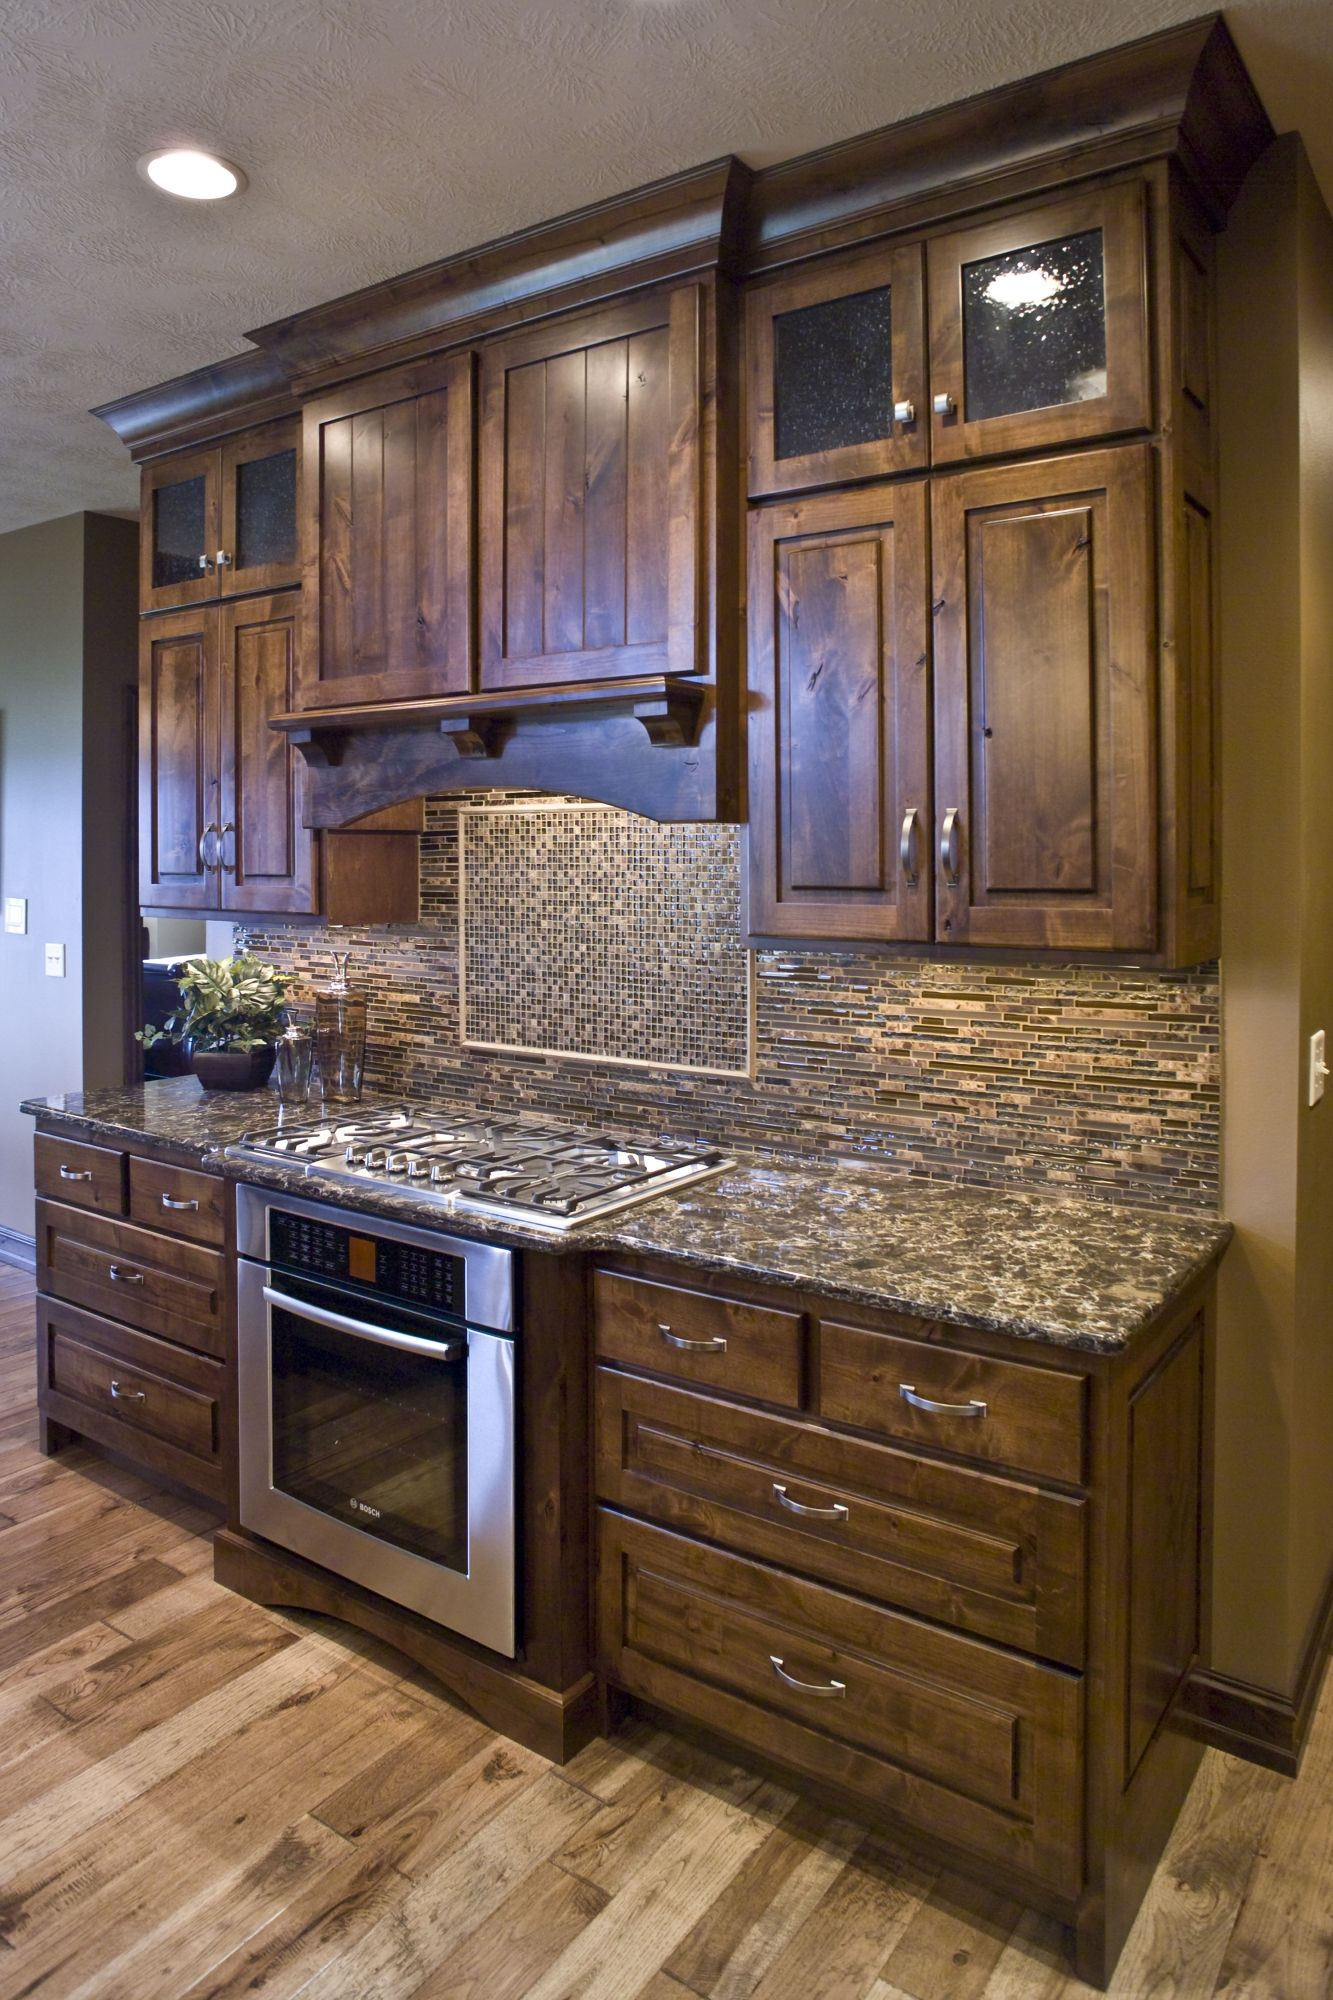 Knotty Alder Kitchen (Cultivate.com) | Home Ideas ...